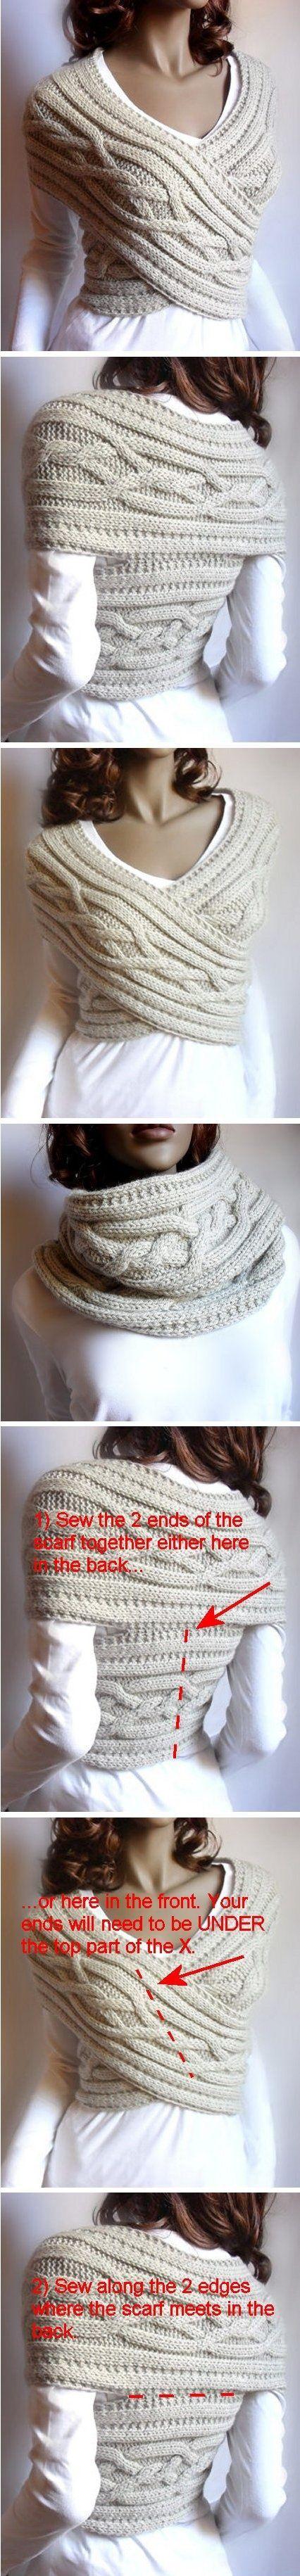 Teje un chaleco de lana cruzado | crochet | Pinterest | Cruzado ...